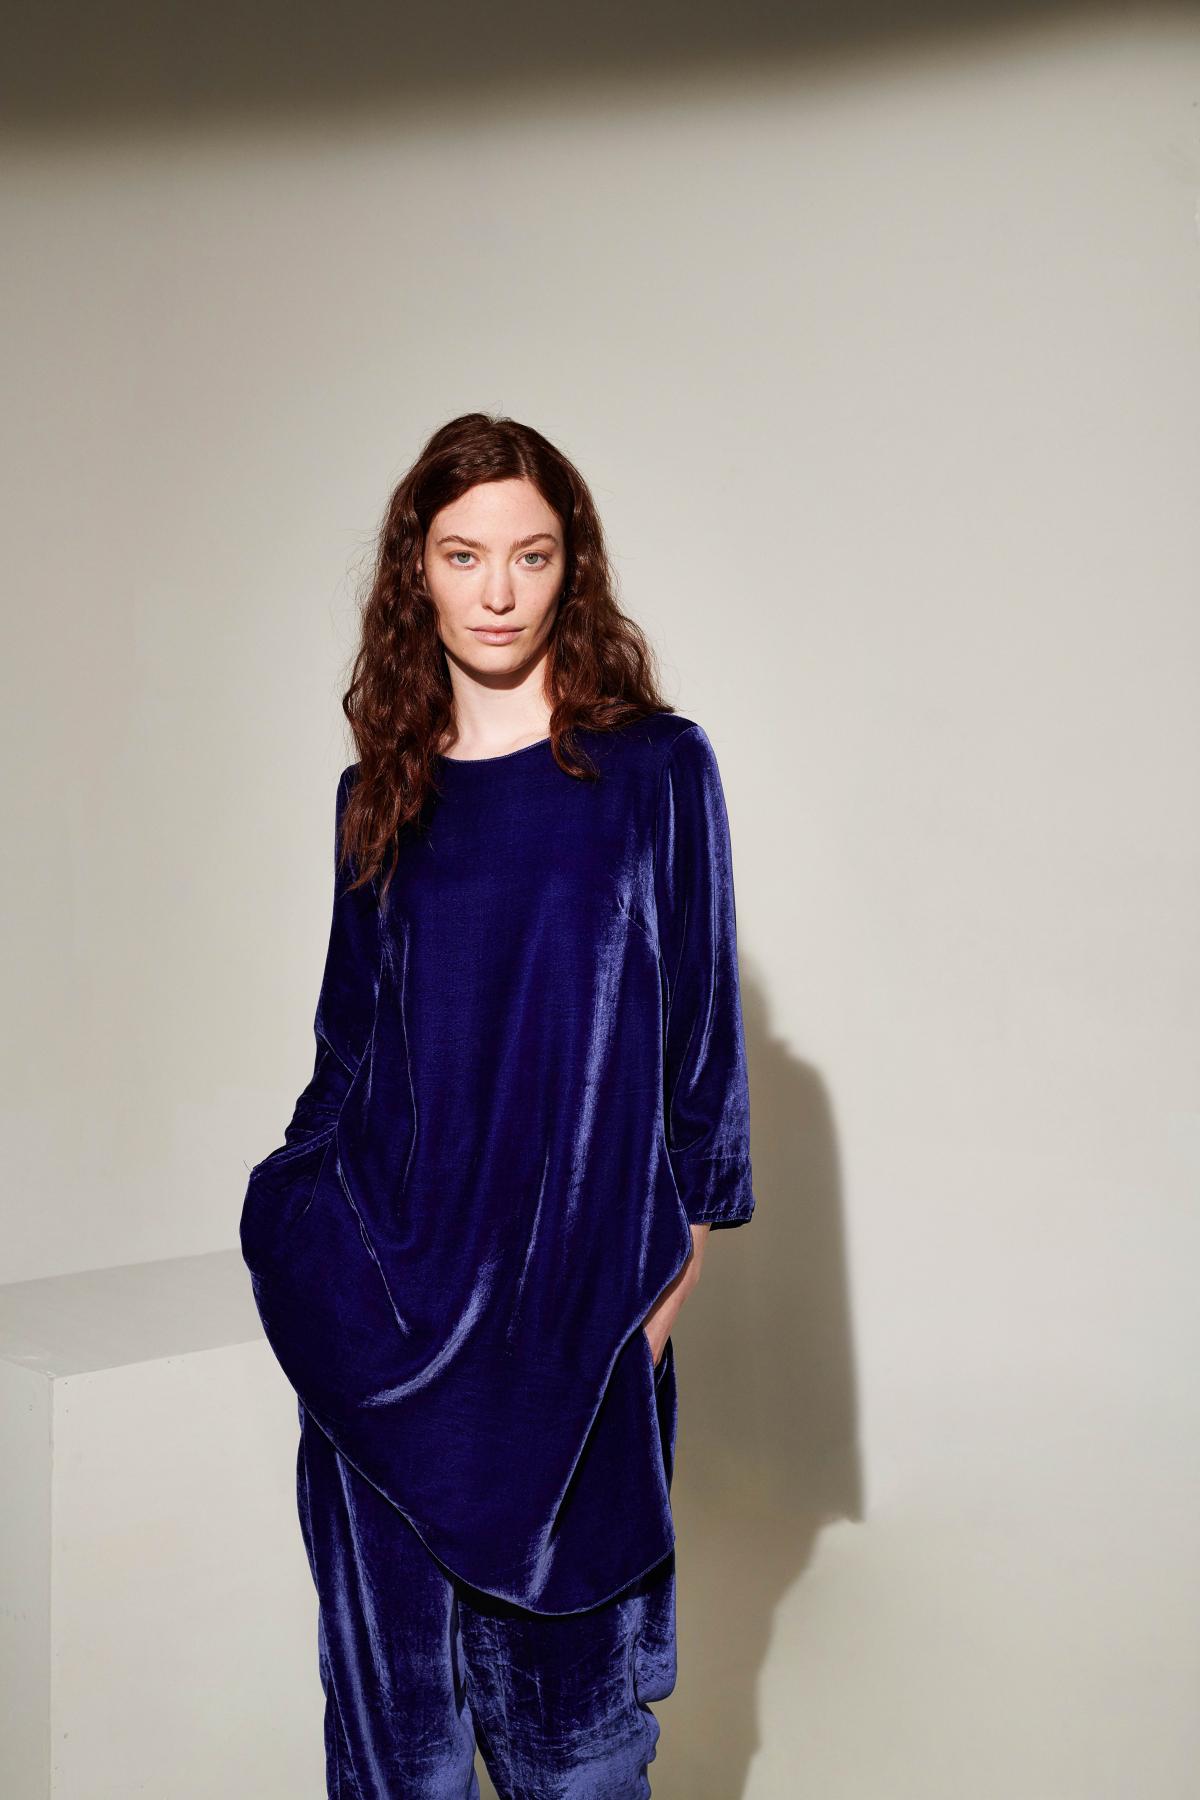 style ADA135POG dress